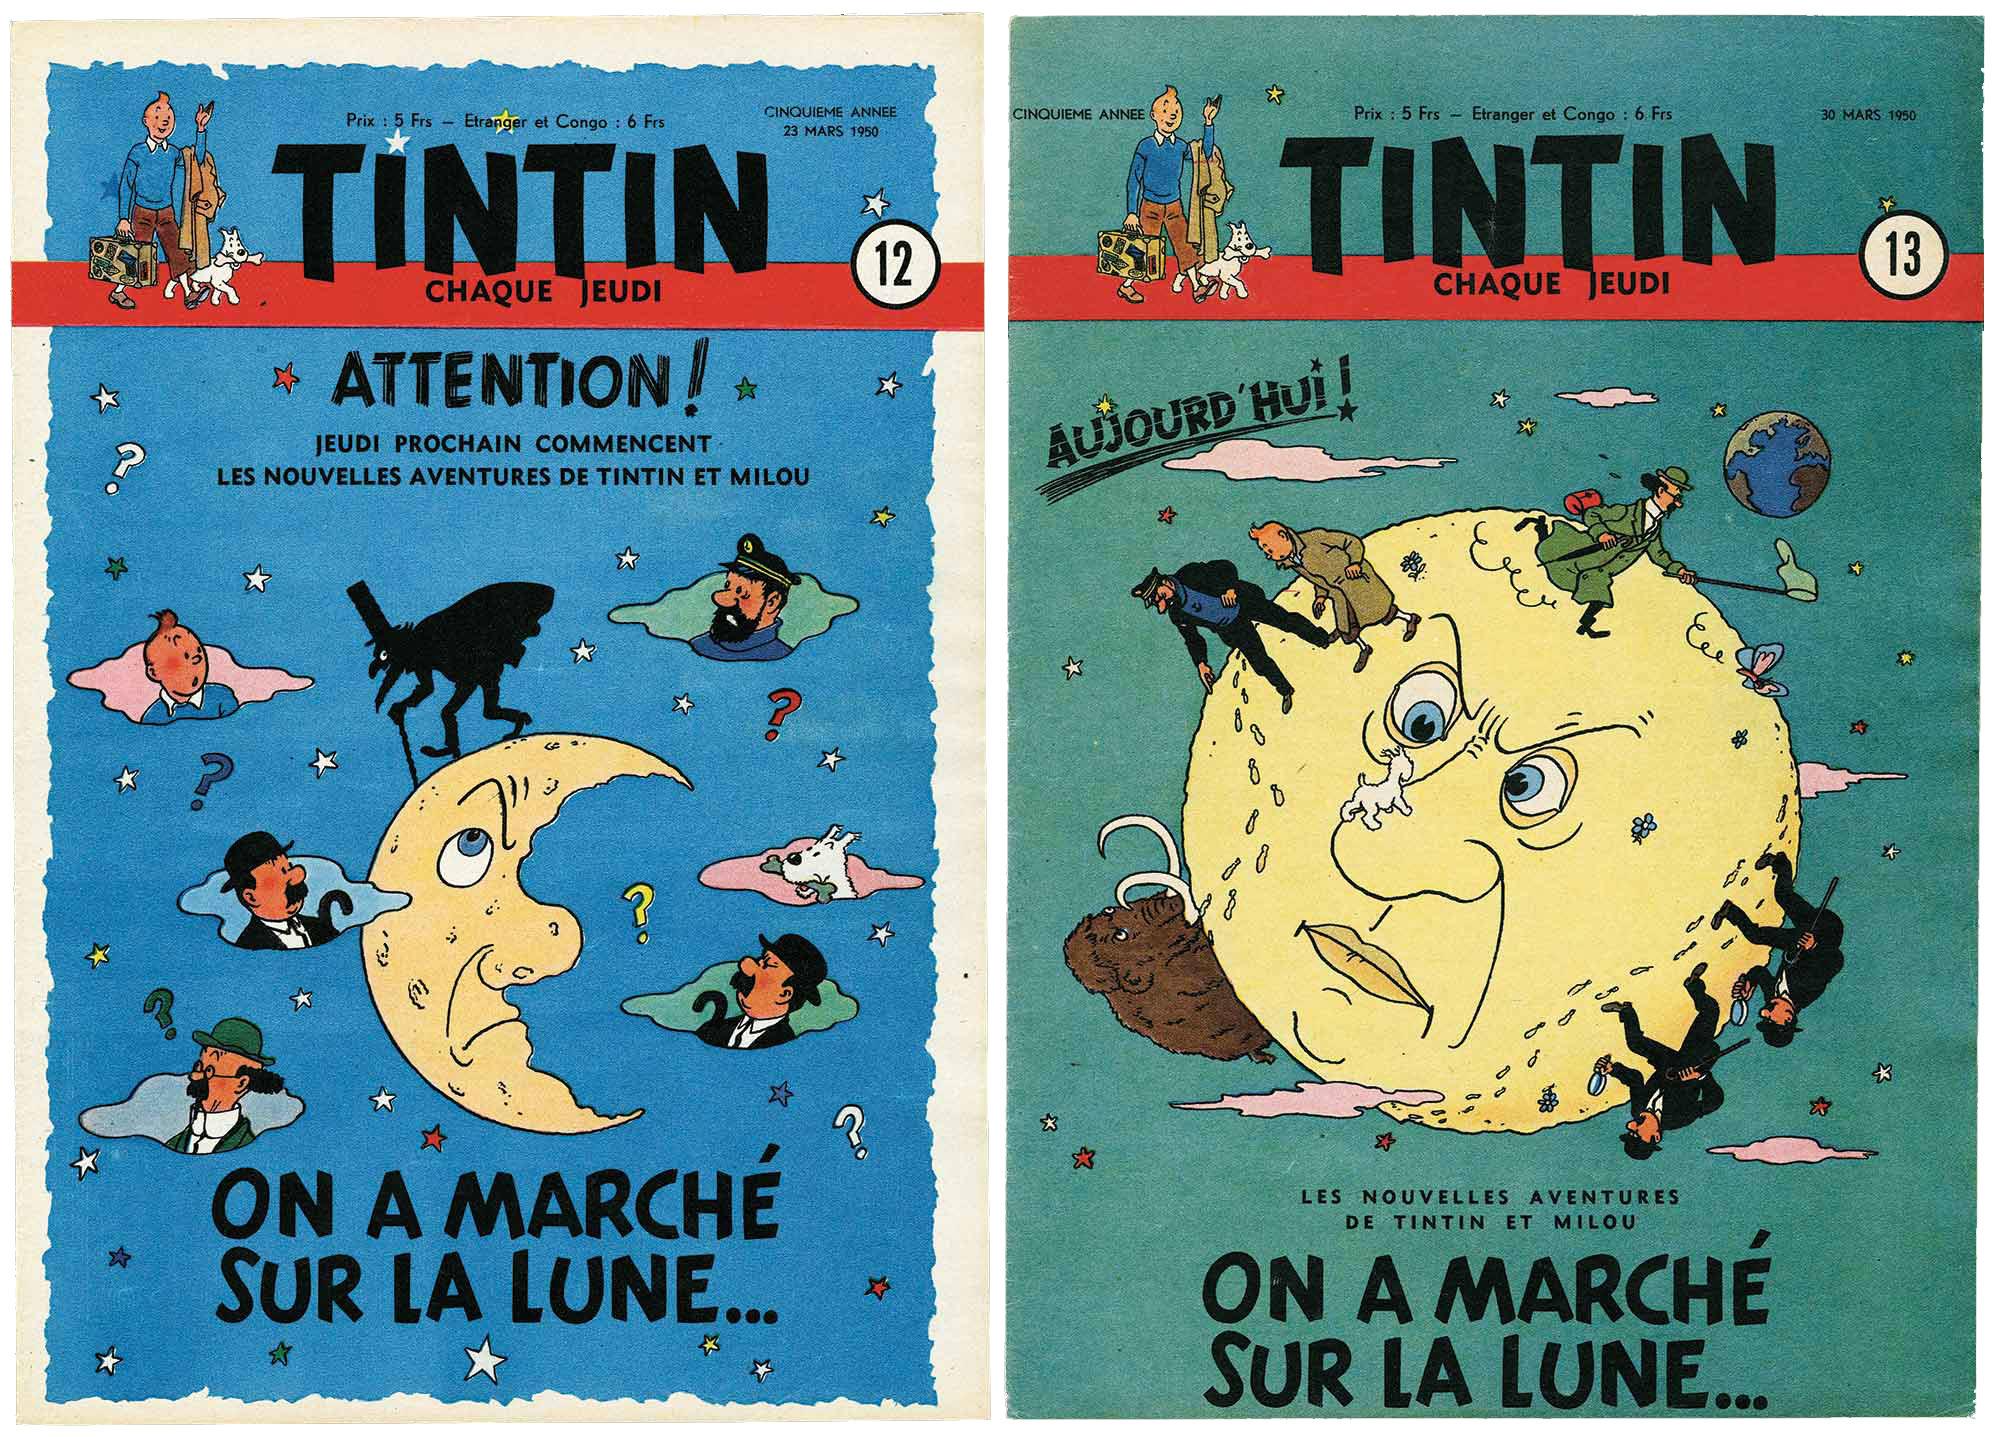 Tintin - Les Aventures de Tintin - Objectif Lune - Le Journal de Tintin